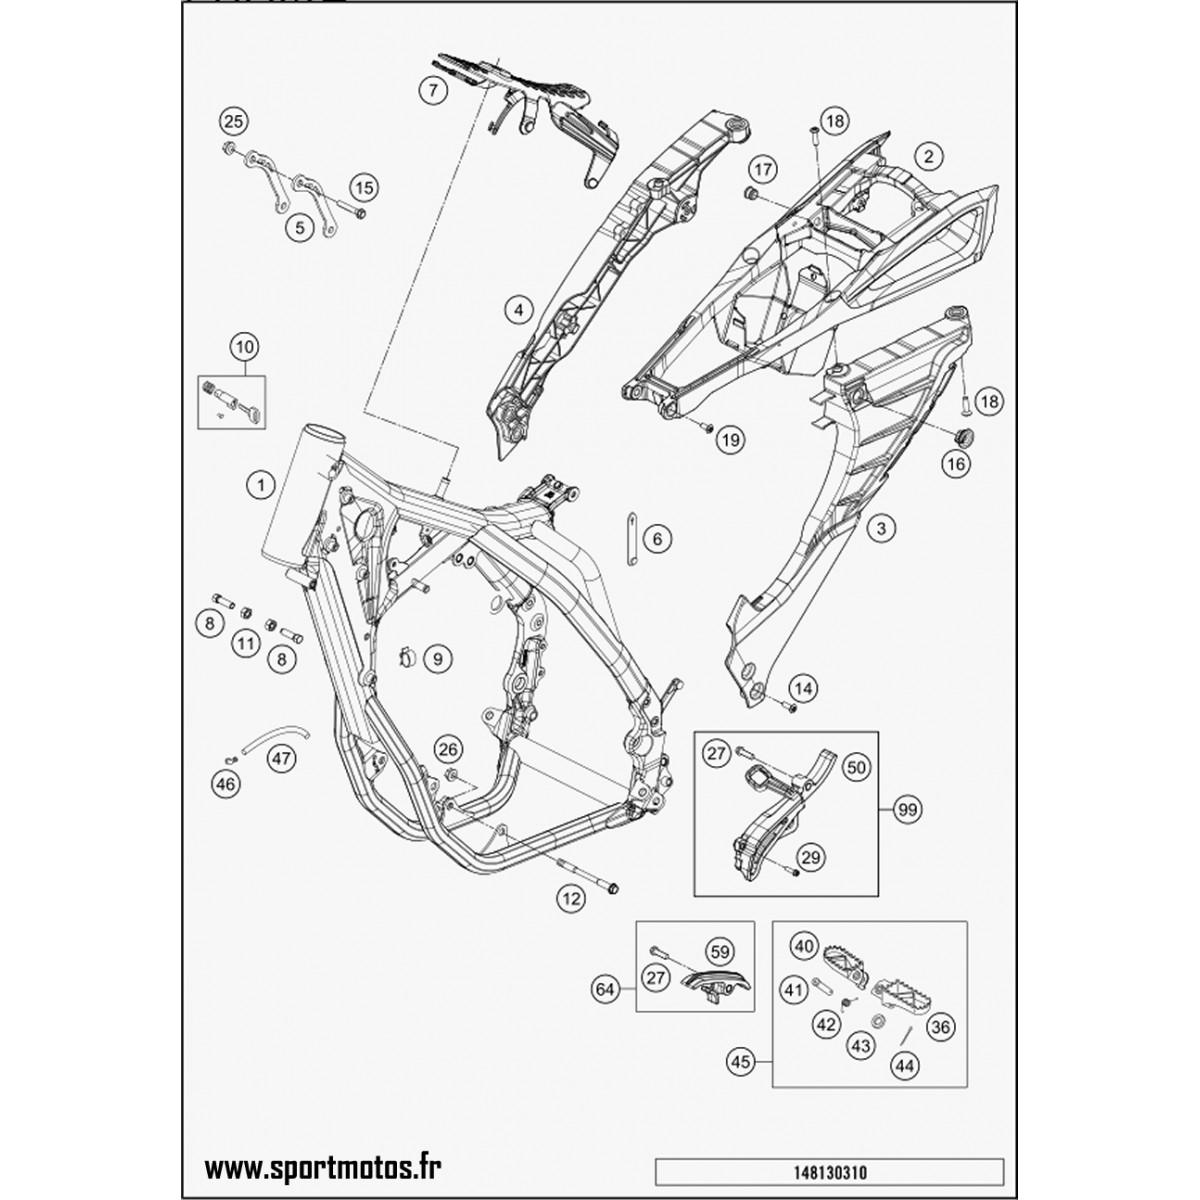 2017 Fiat Fiorino Wiring Diagrams further Ducati 749 Wiring Diagram moreover WiringHonda moreover 1999 Arctic Cat 370 Wiring Diagram besides Massey Ferguson 1010 Wiring Diagram. on husaberg wiring diagram